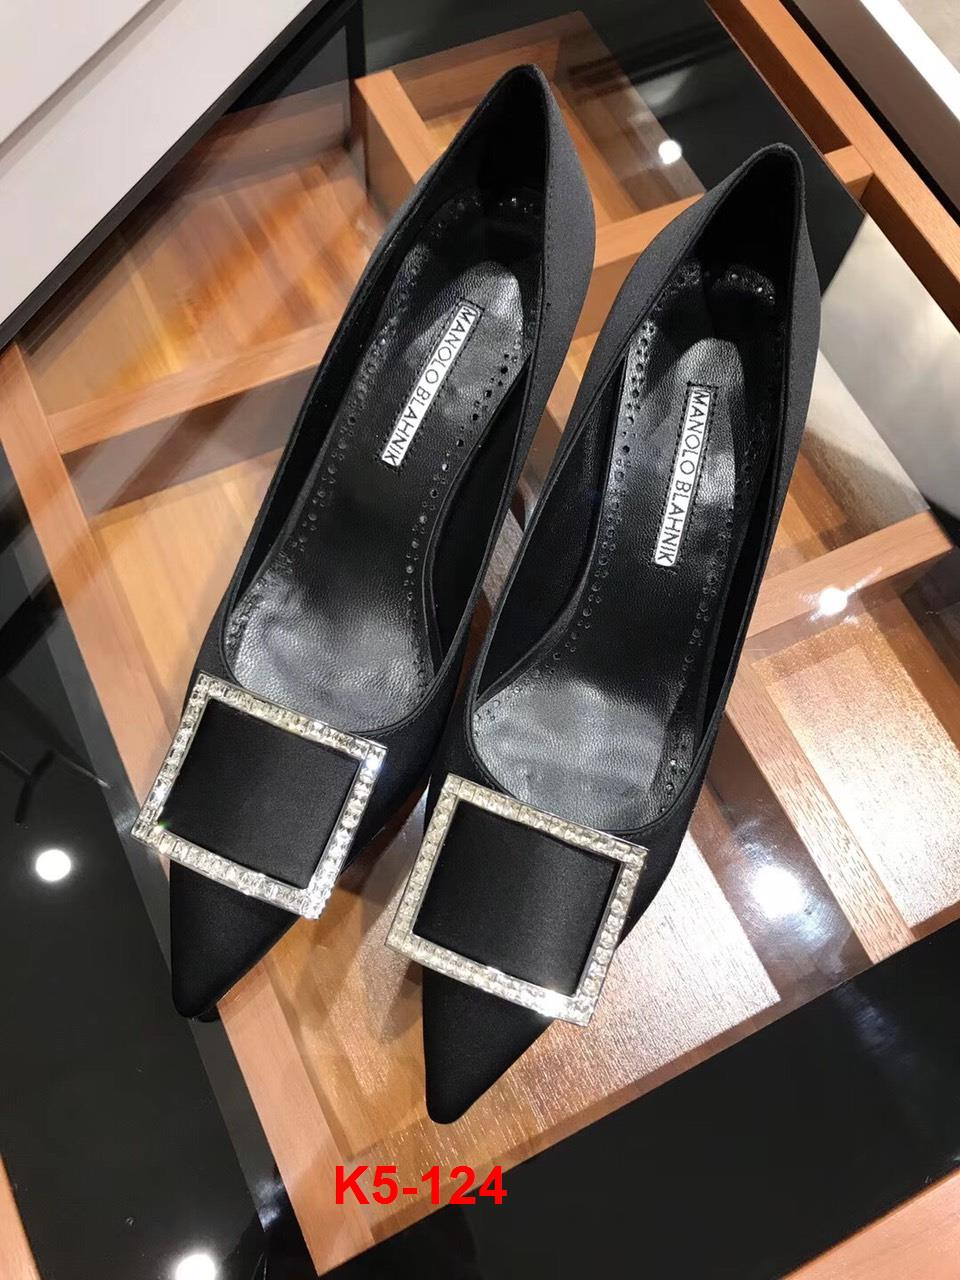 K5-124 Manolo Blahnik giày cao 7cm siêu cấp